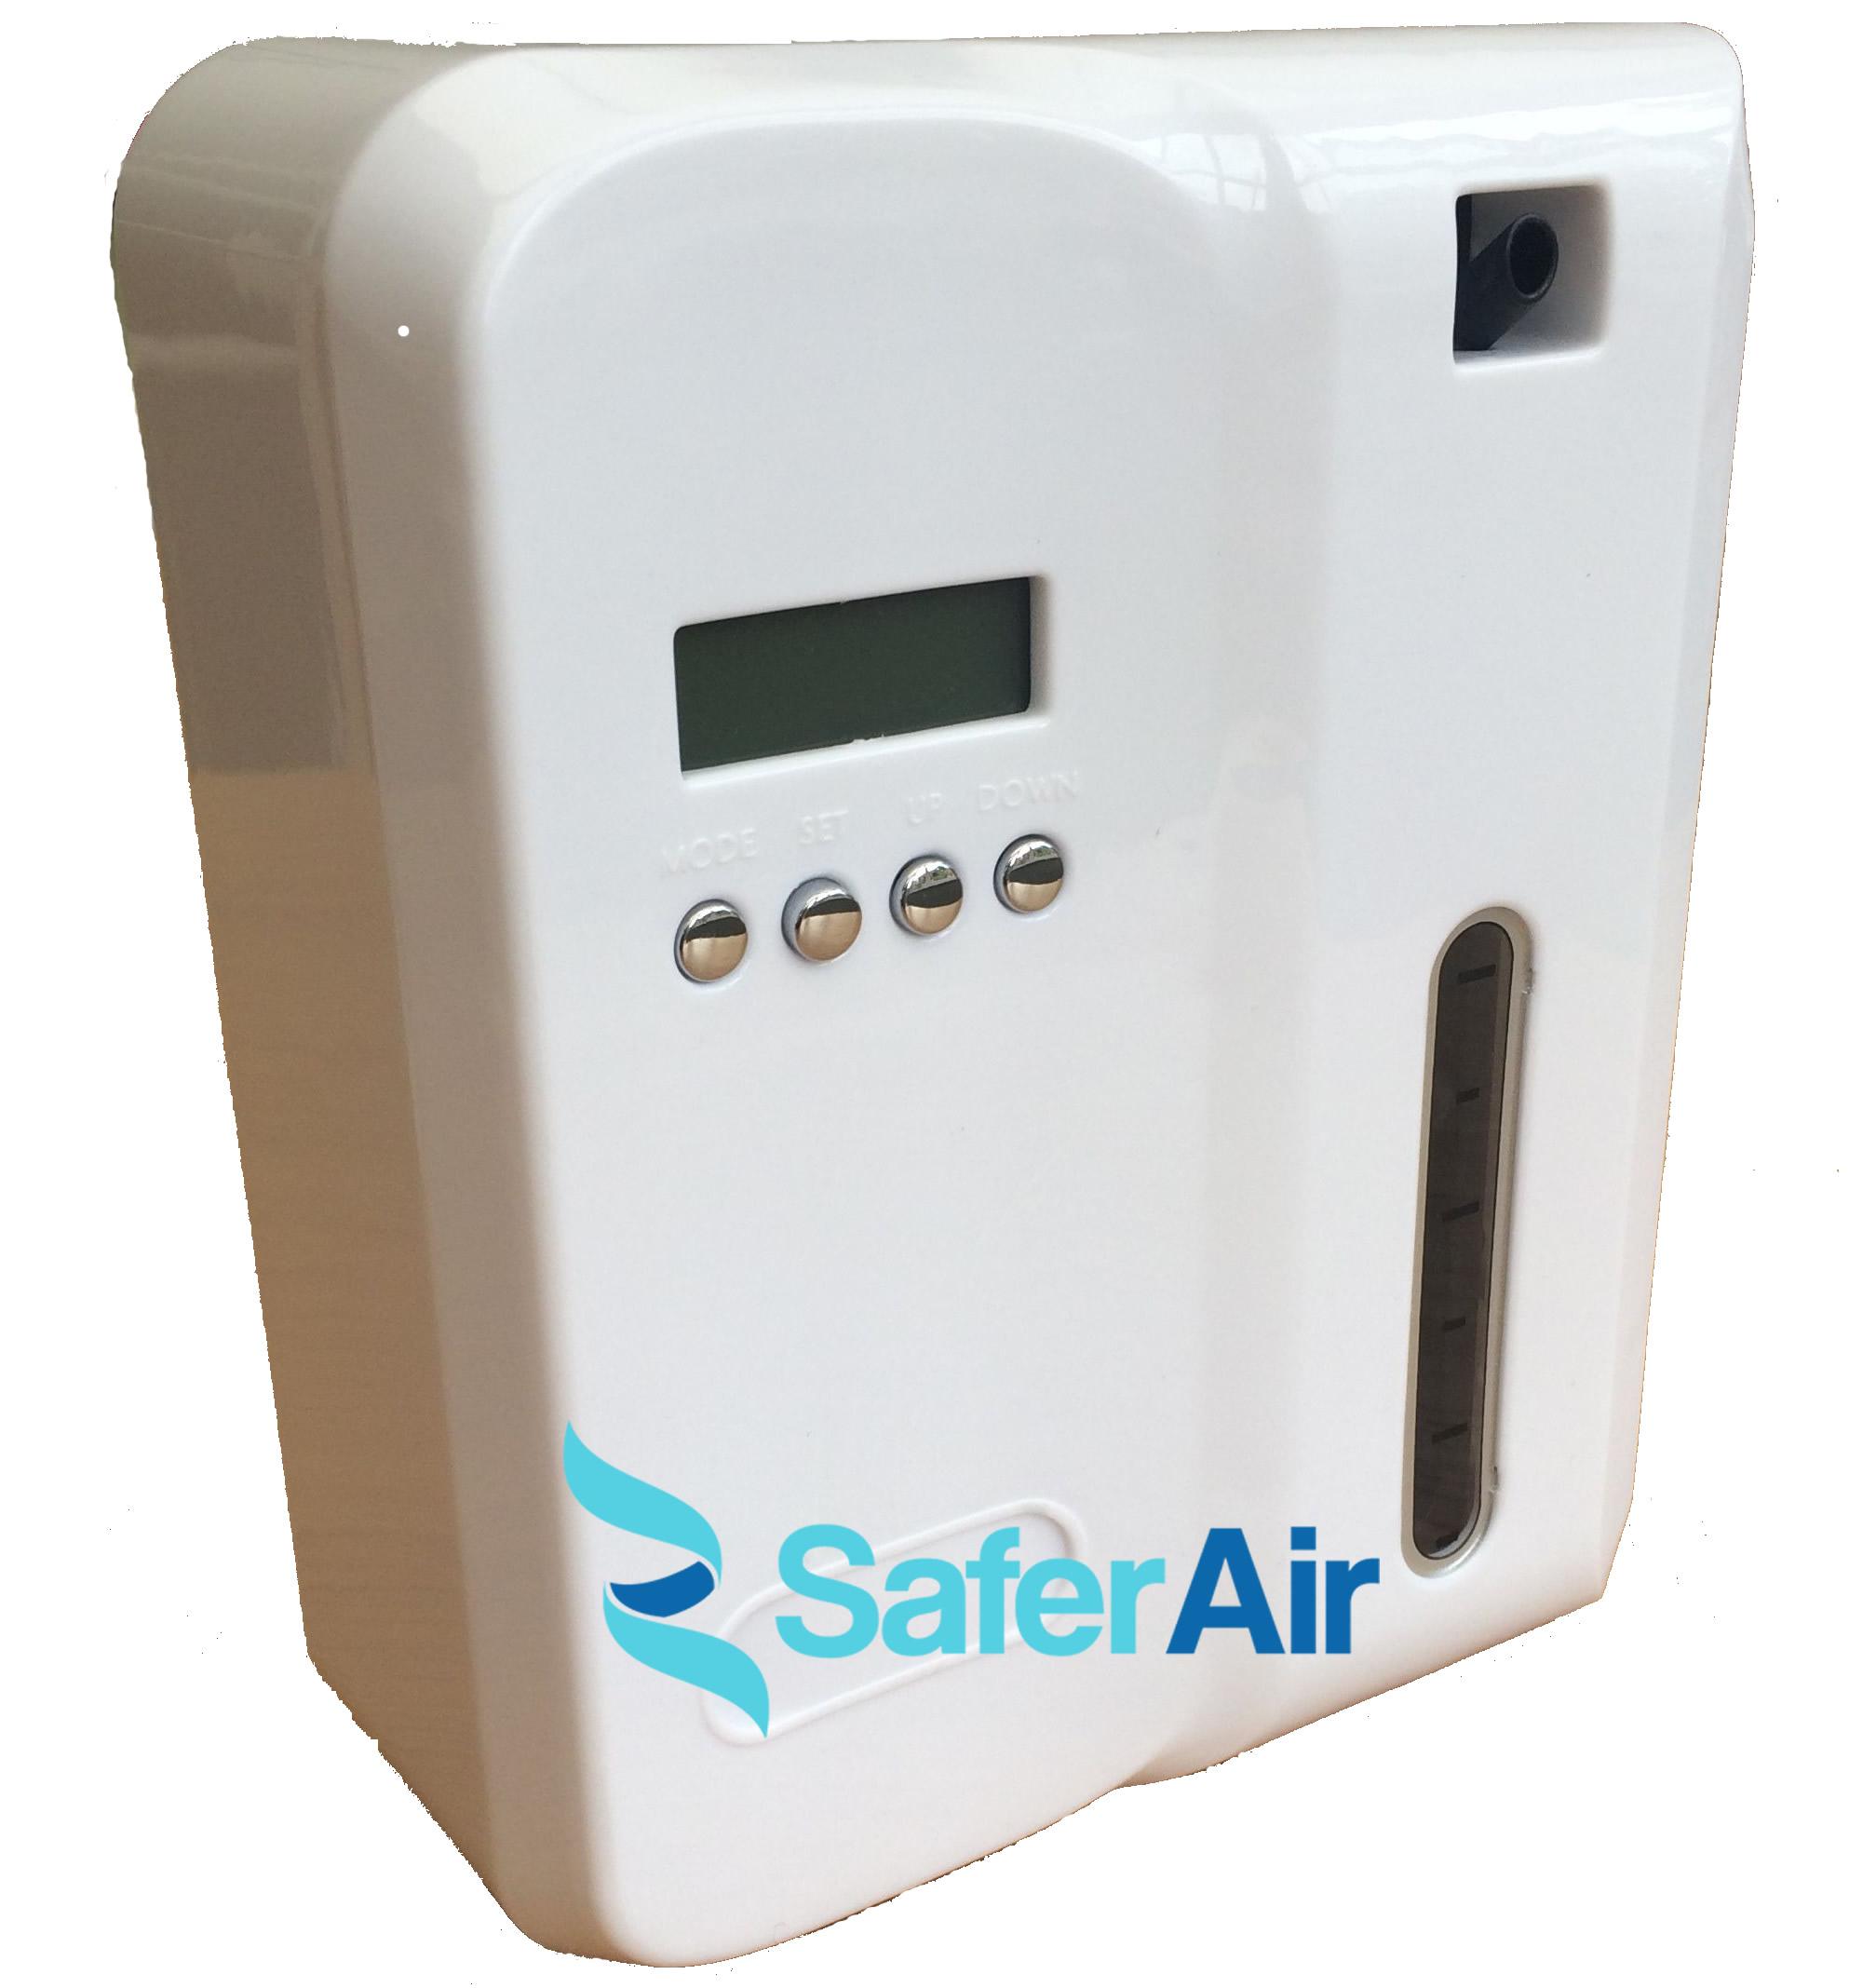 Saferair Guardian Air Purifier Wall Mounted No Pet Pong